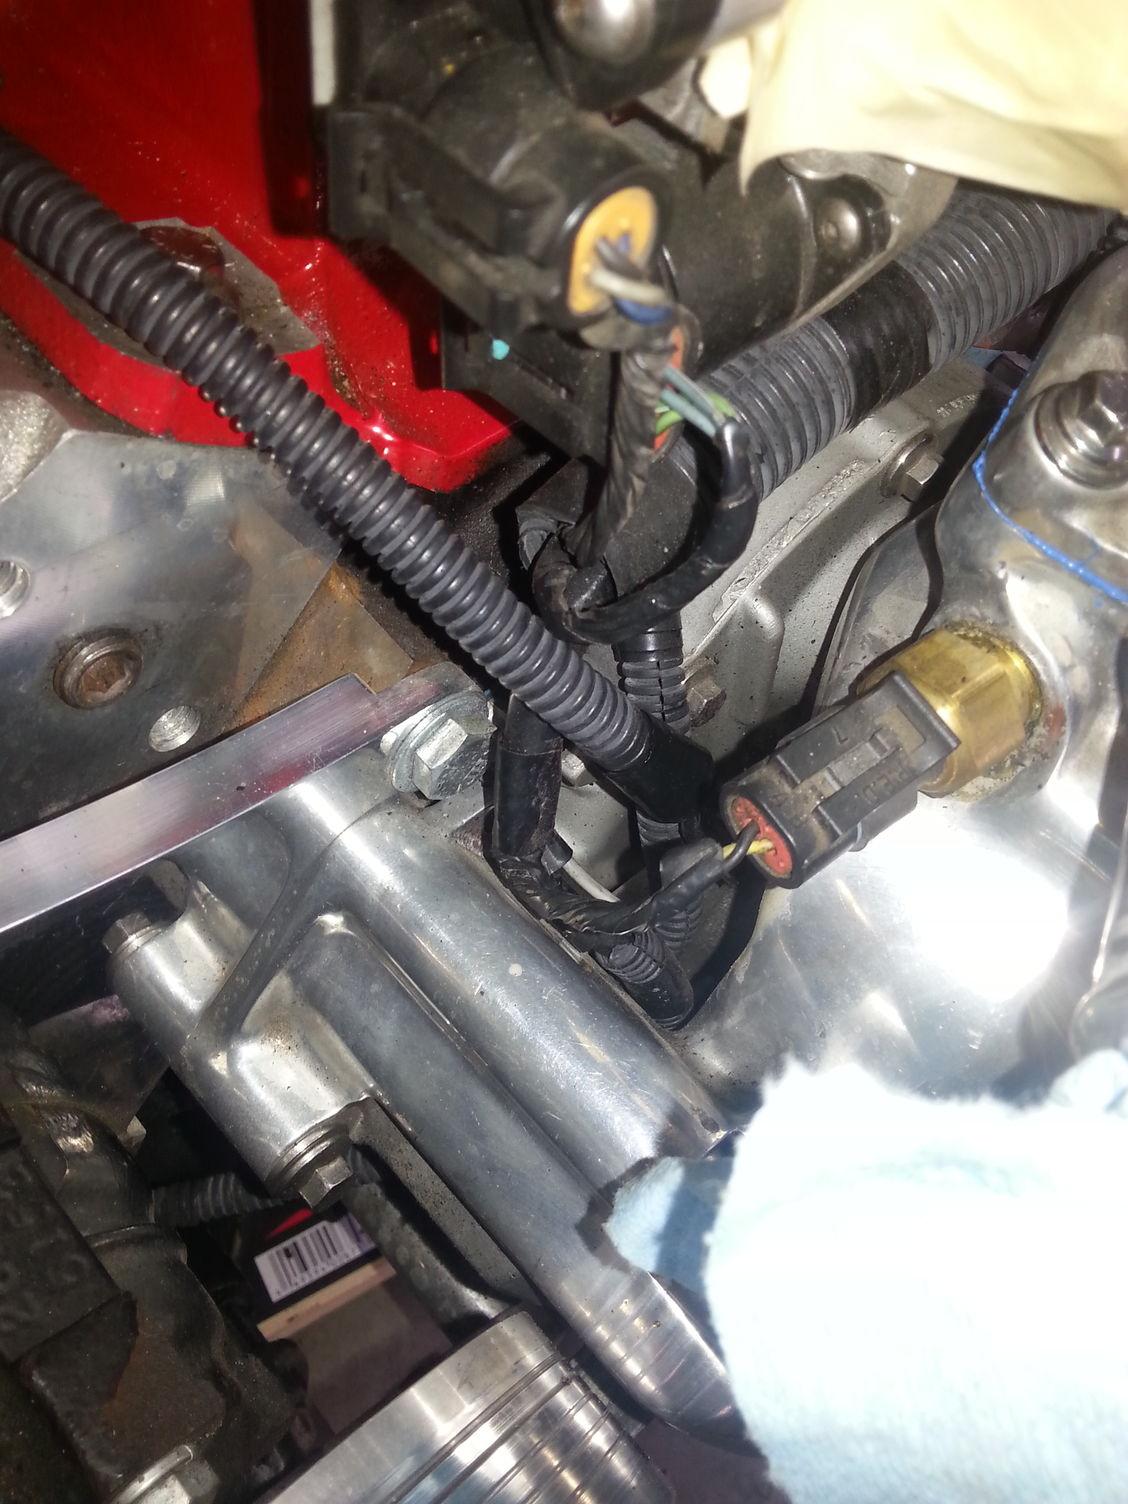 24x Lt1 Wiring Harness Automotive Diagram Firebird Engine For Ls1tech Camaro And Forum 95